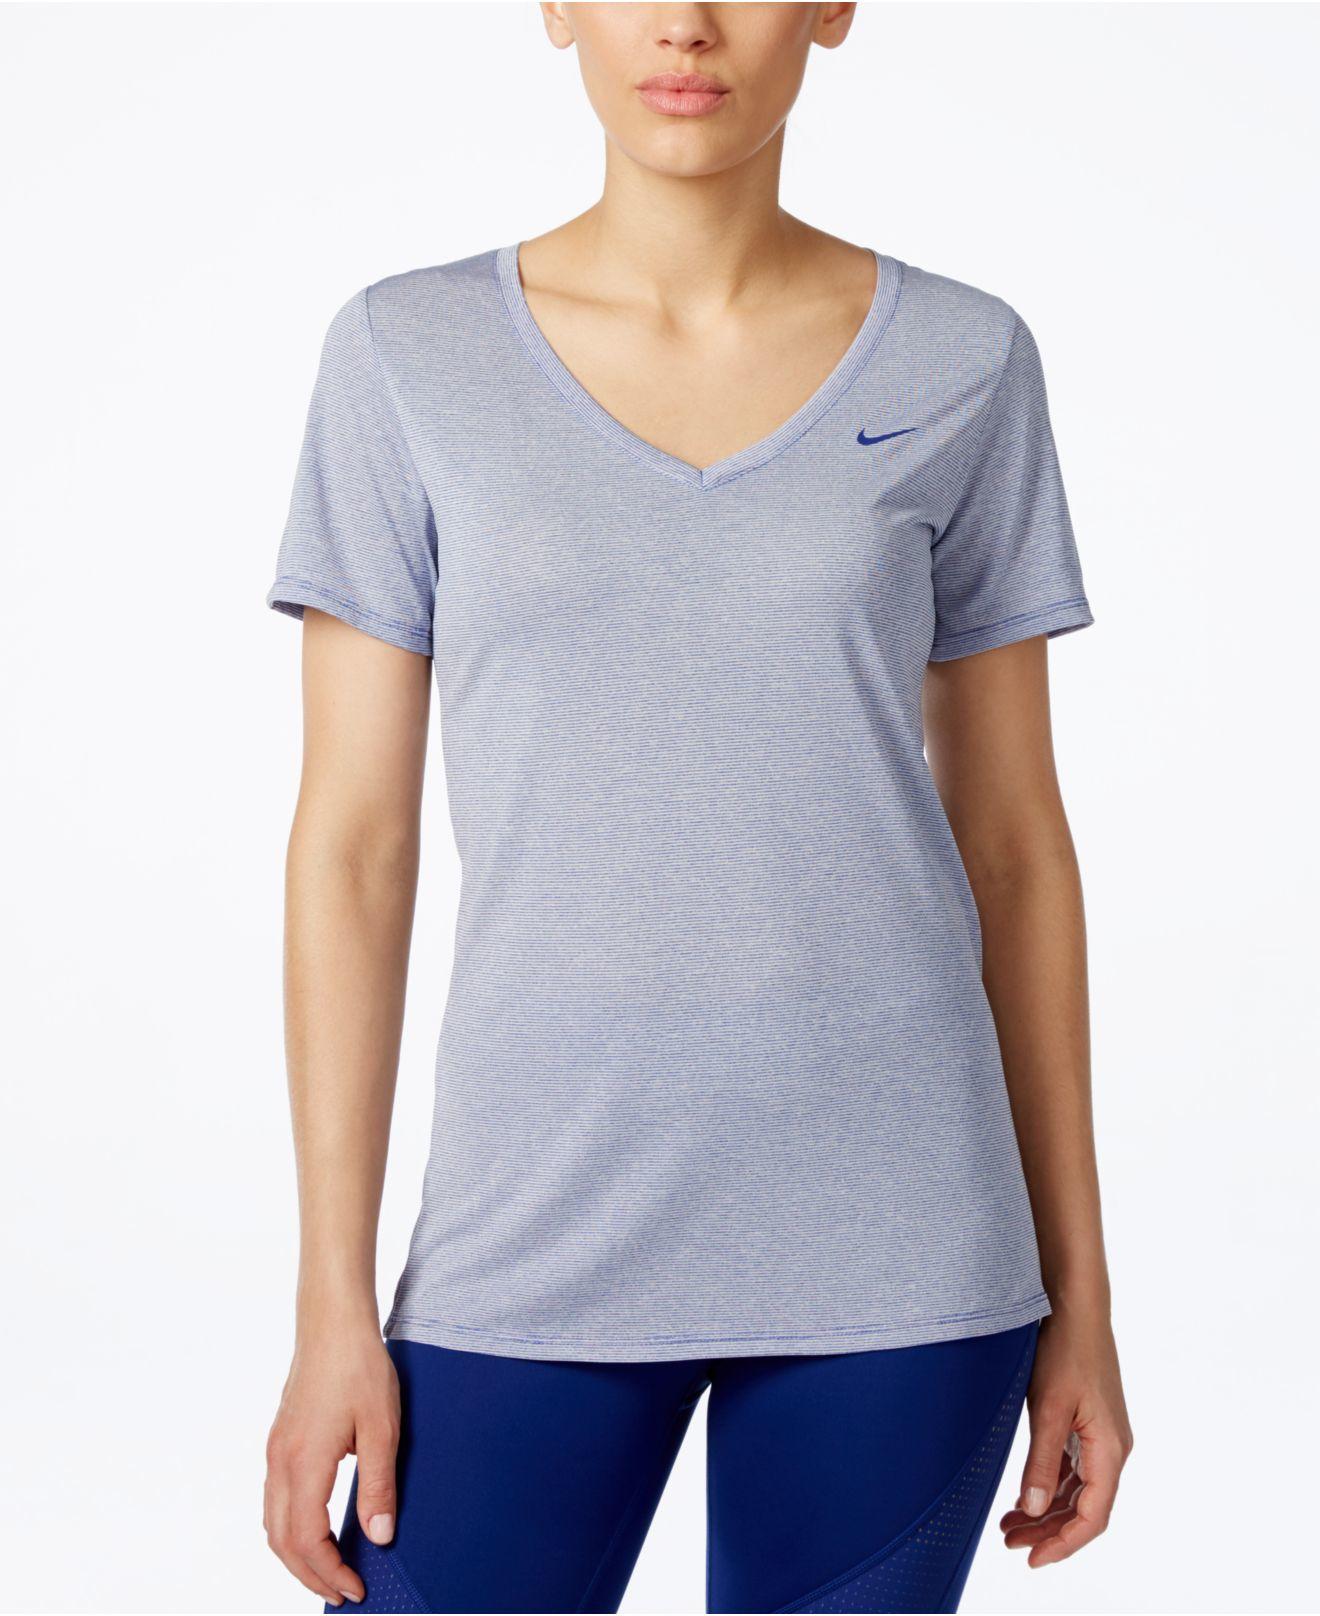 Nike legend veneer v neck dri fit t shirt in blue lyst for Dri fit t shirt design